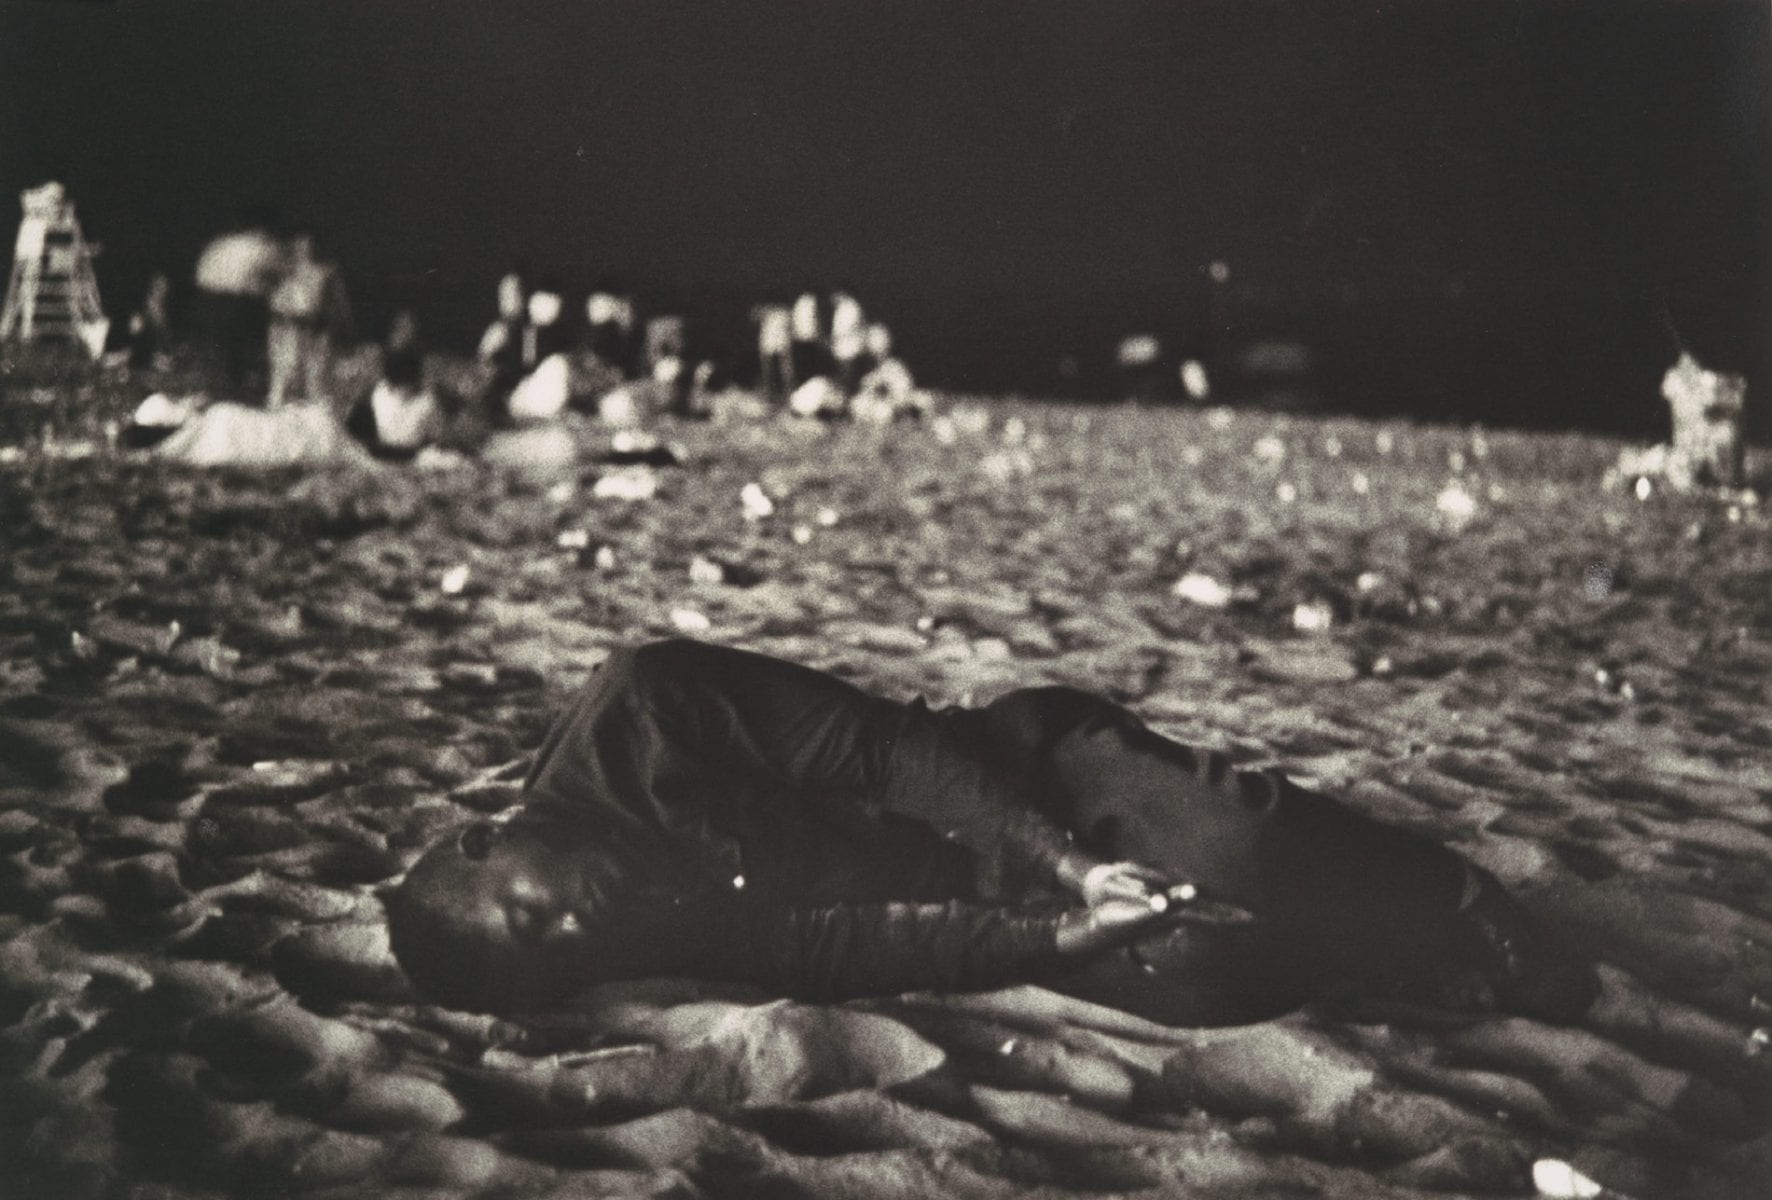 Black & White 七月四日,美国康尼岛,1958年©Robert Frank Photography and dreams